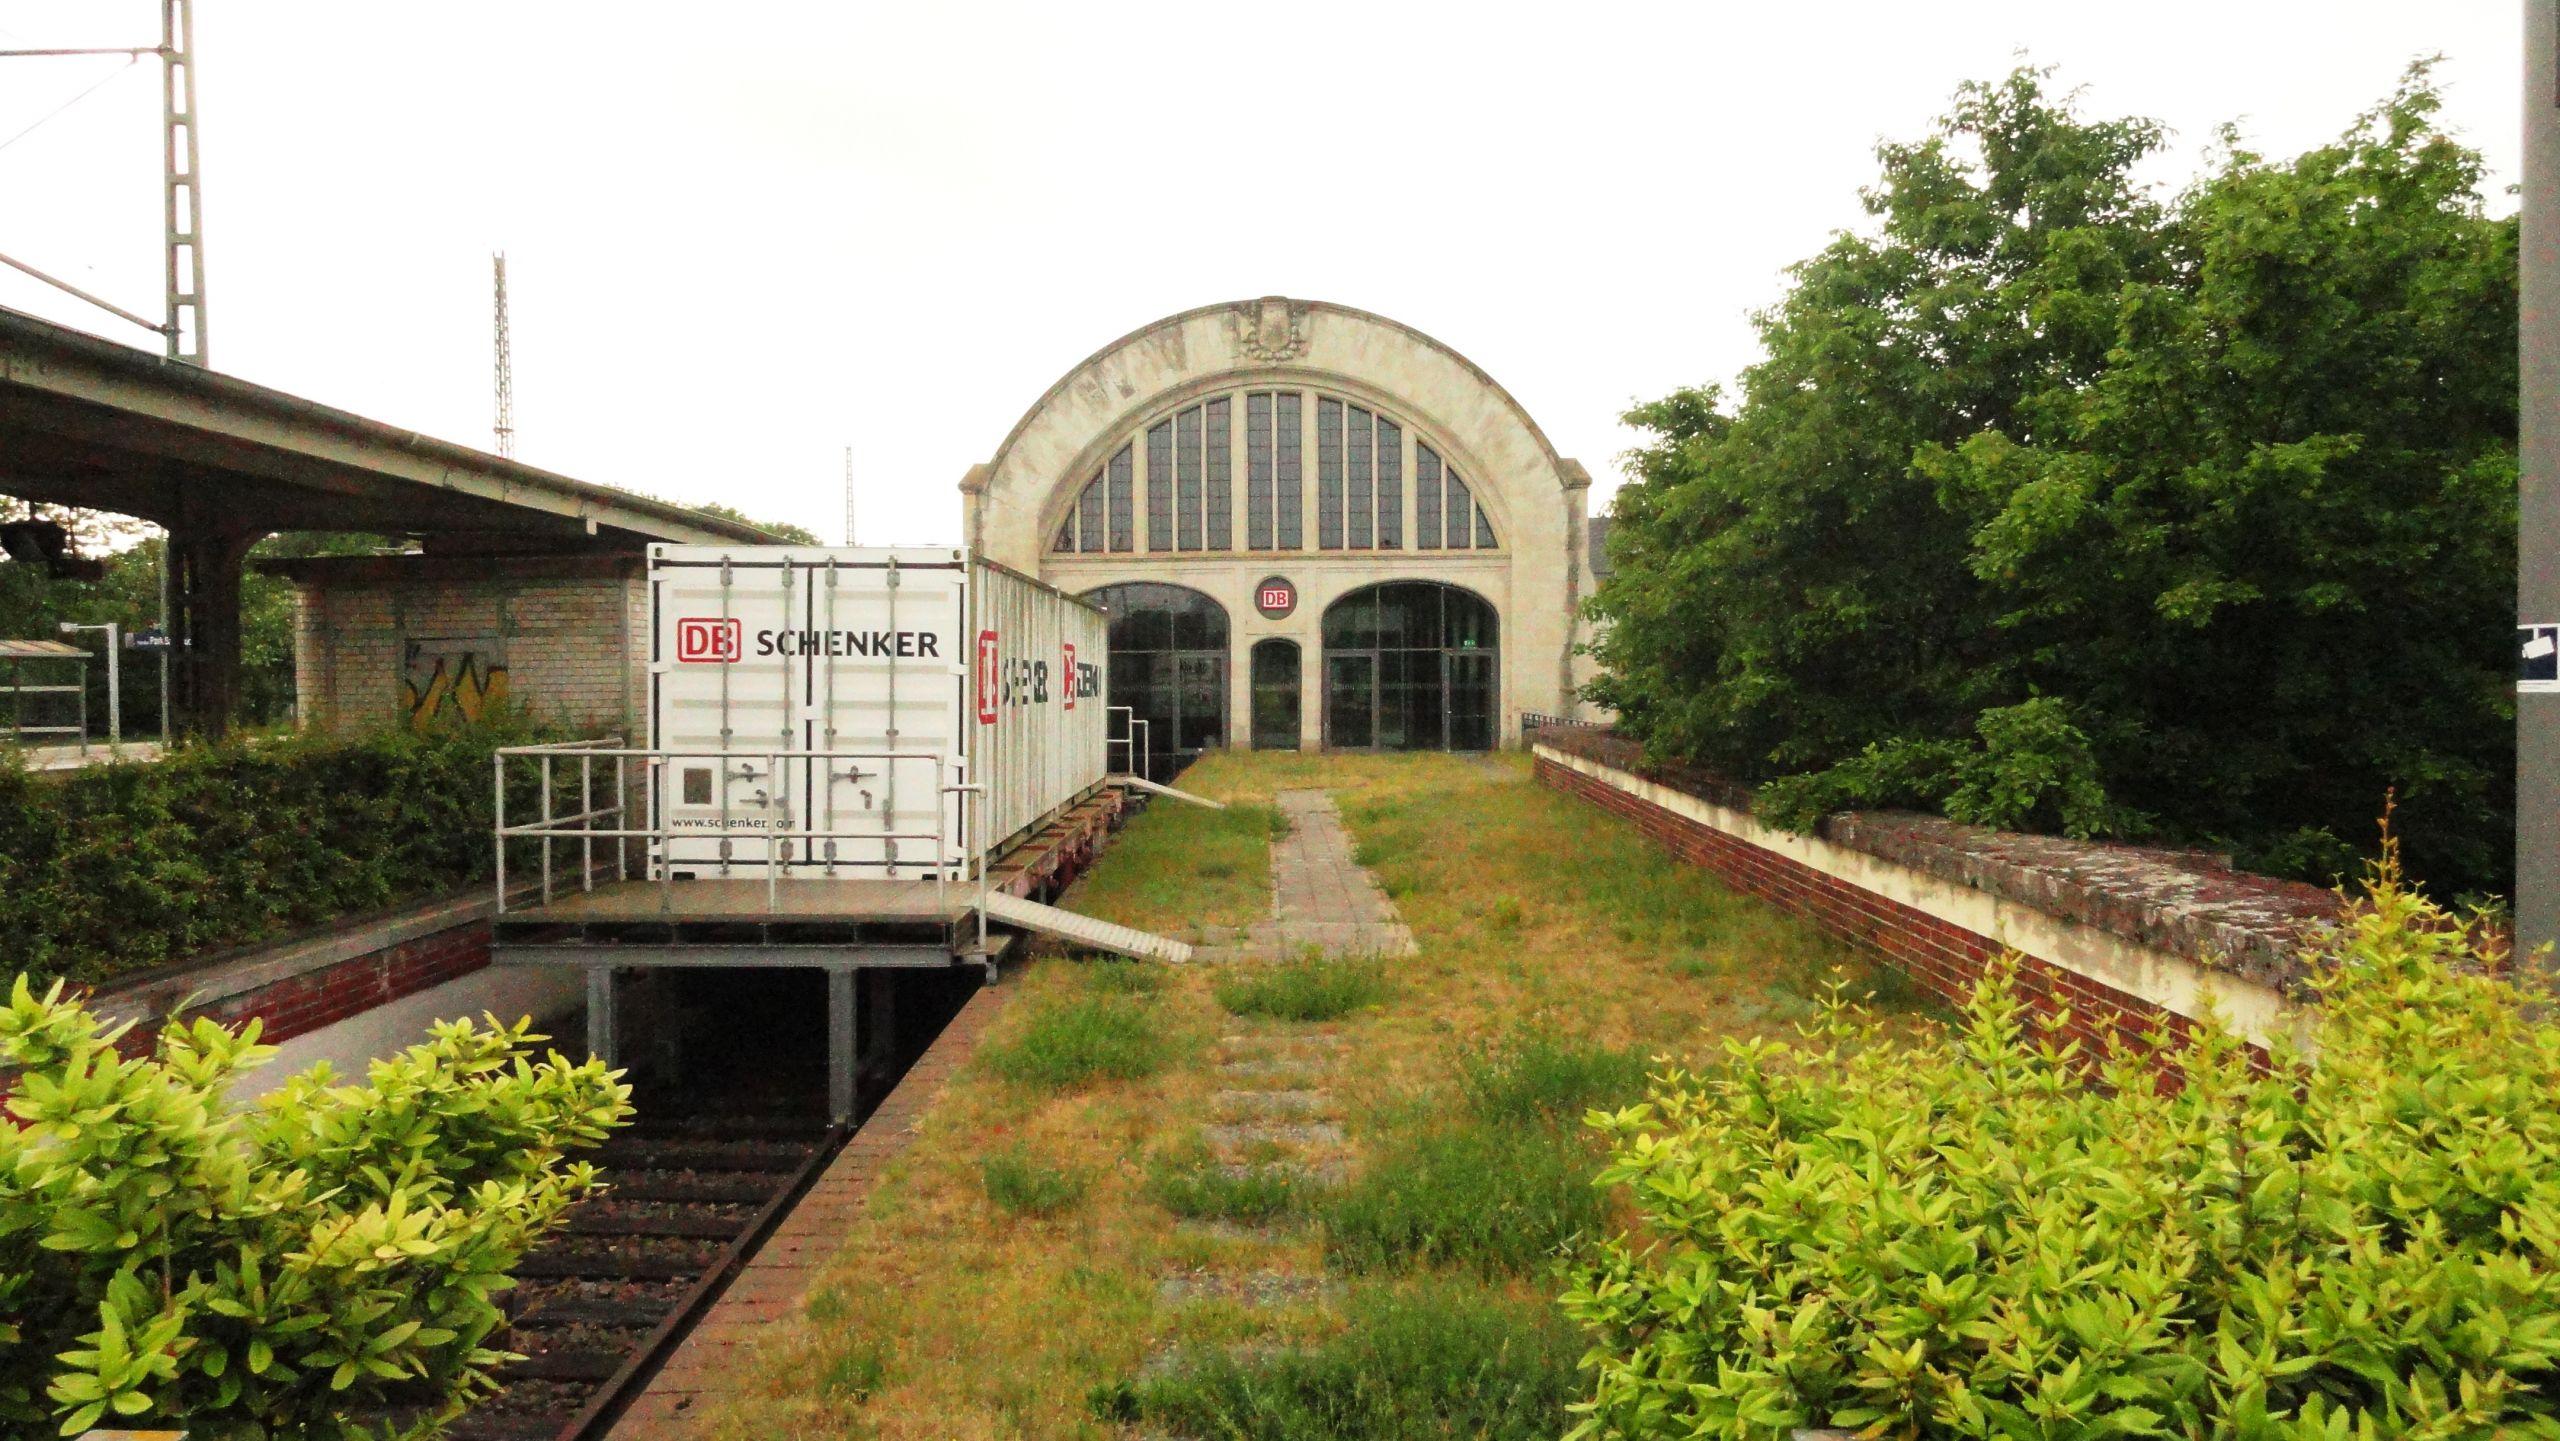 Potsdam Am Neuen Palais 1 Kaiserbahnhof 1